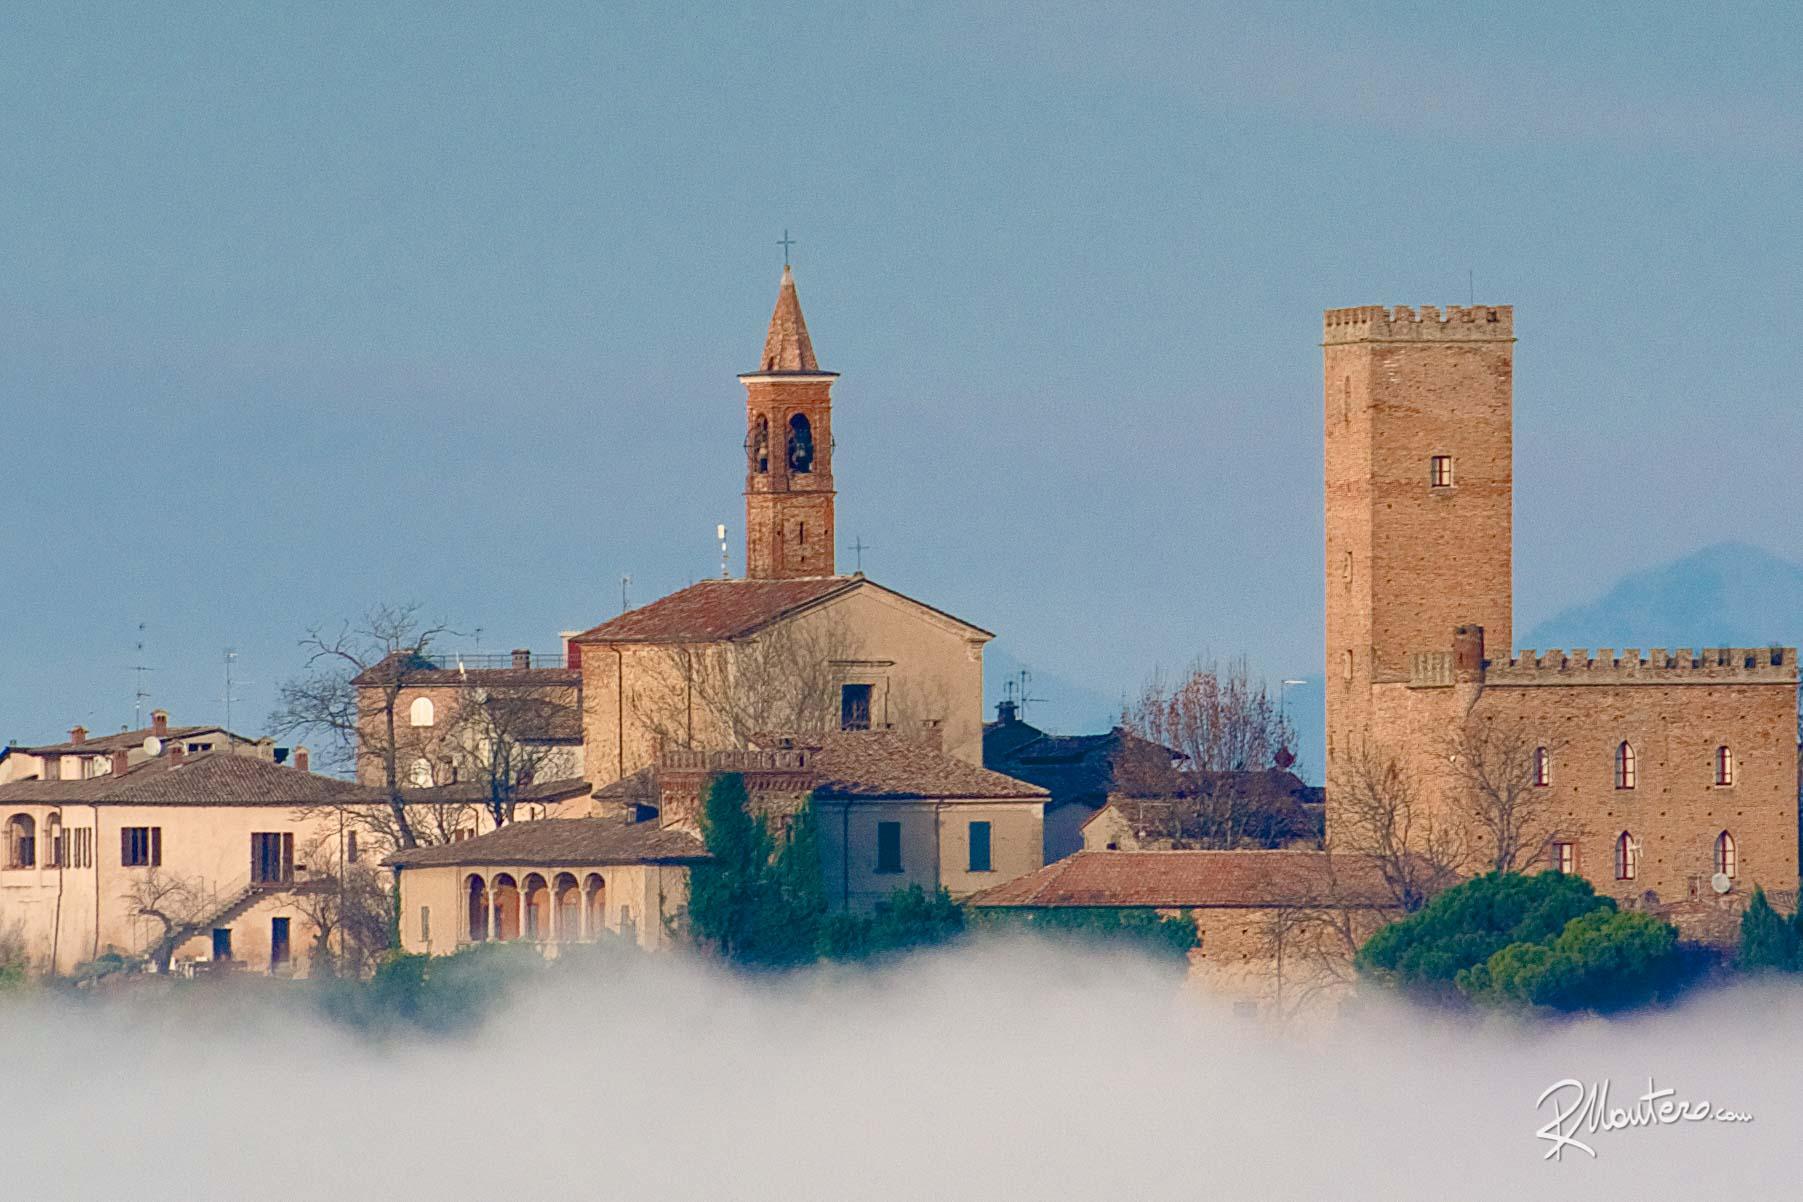 10 - Nazzano Castle 400mm Crop 3